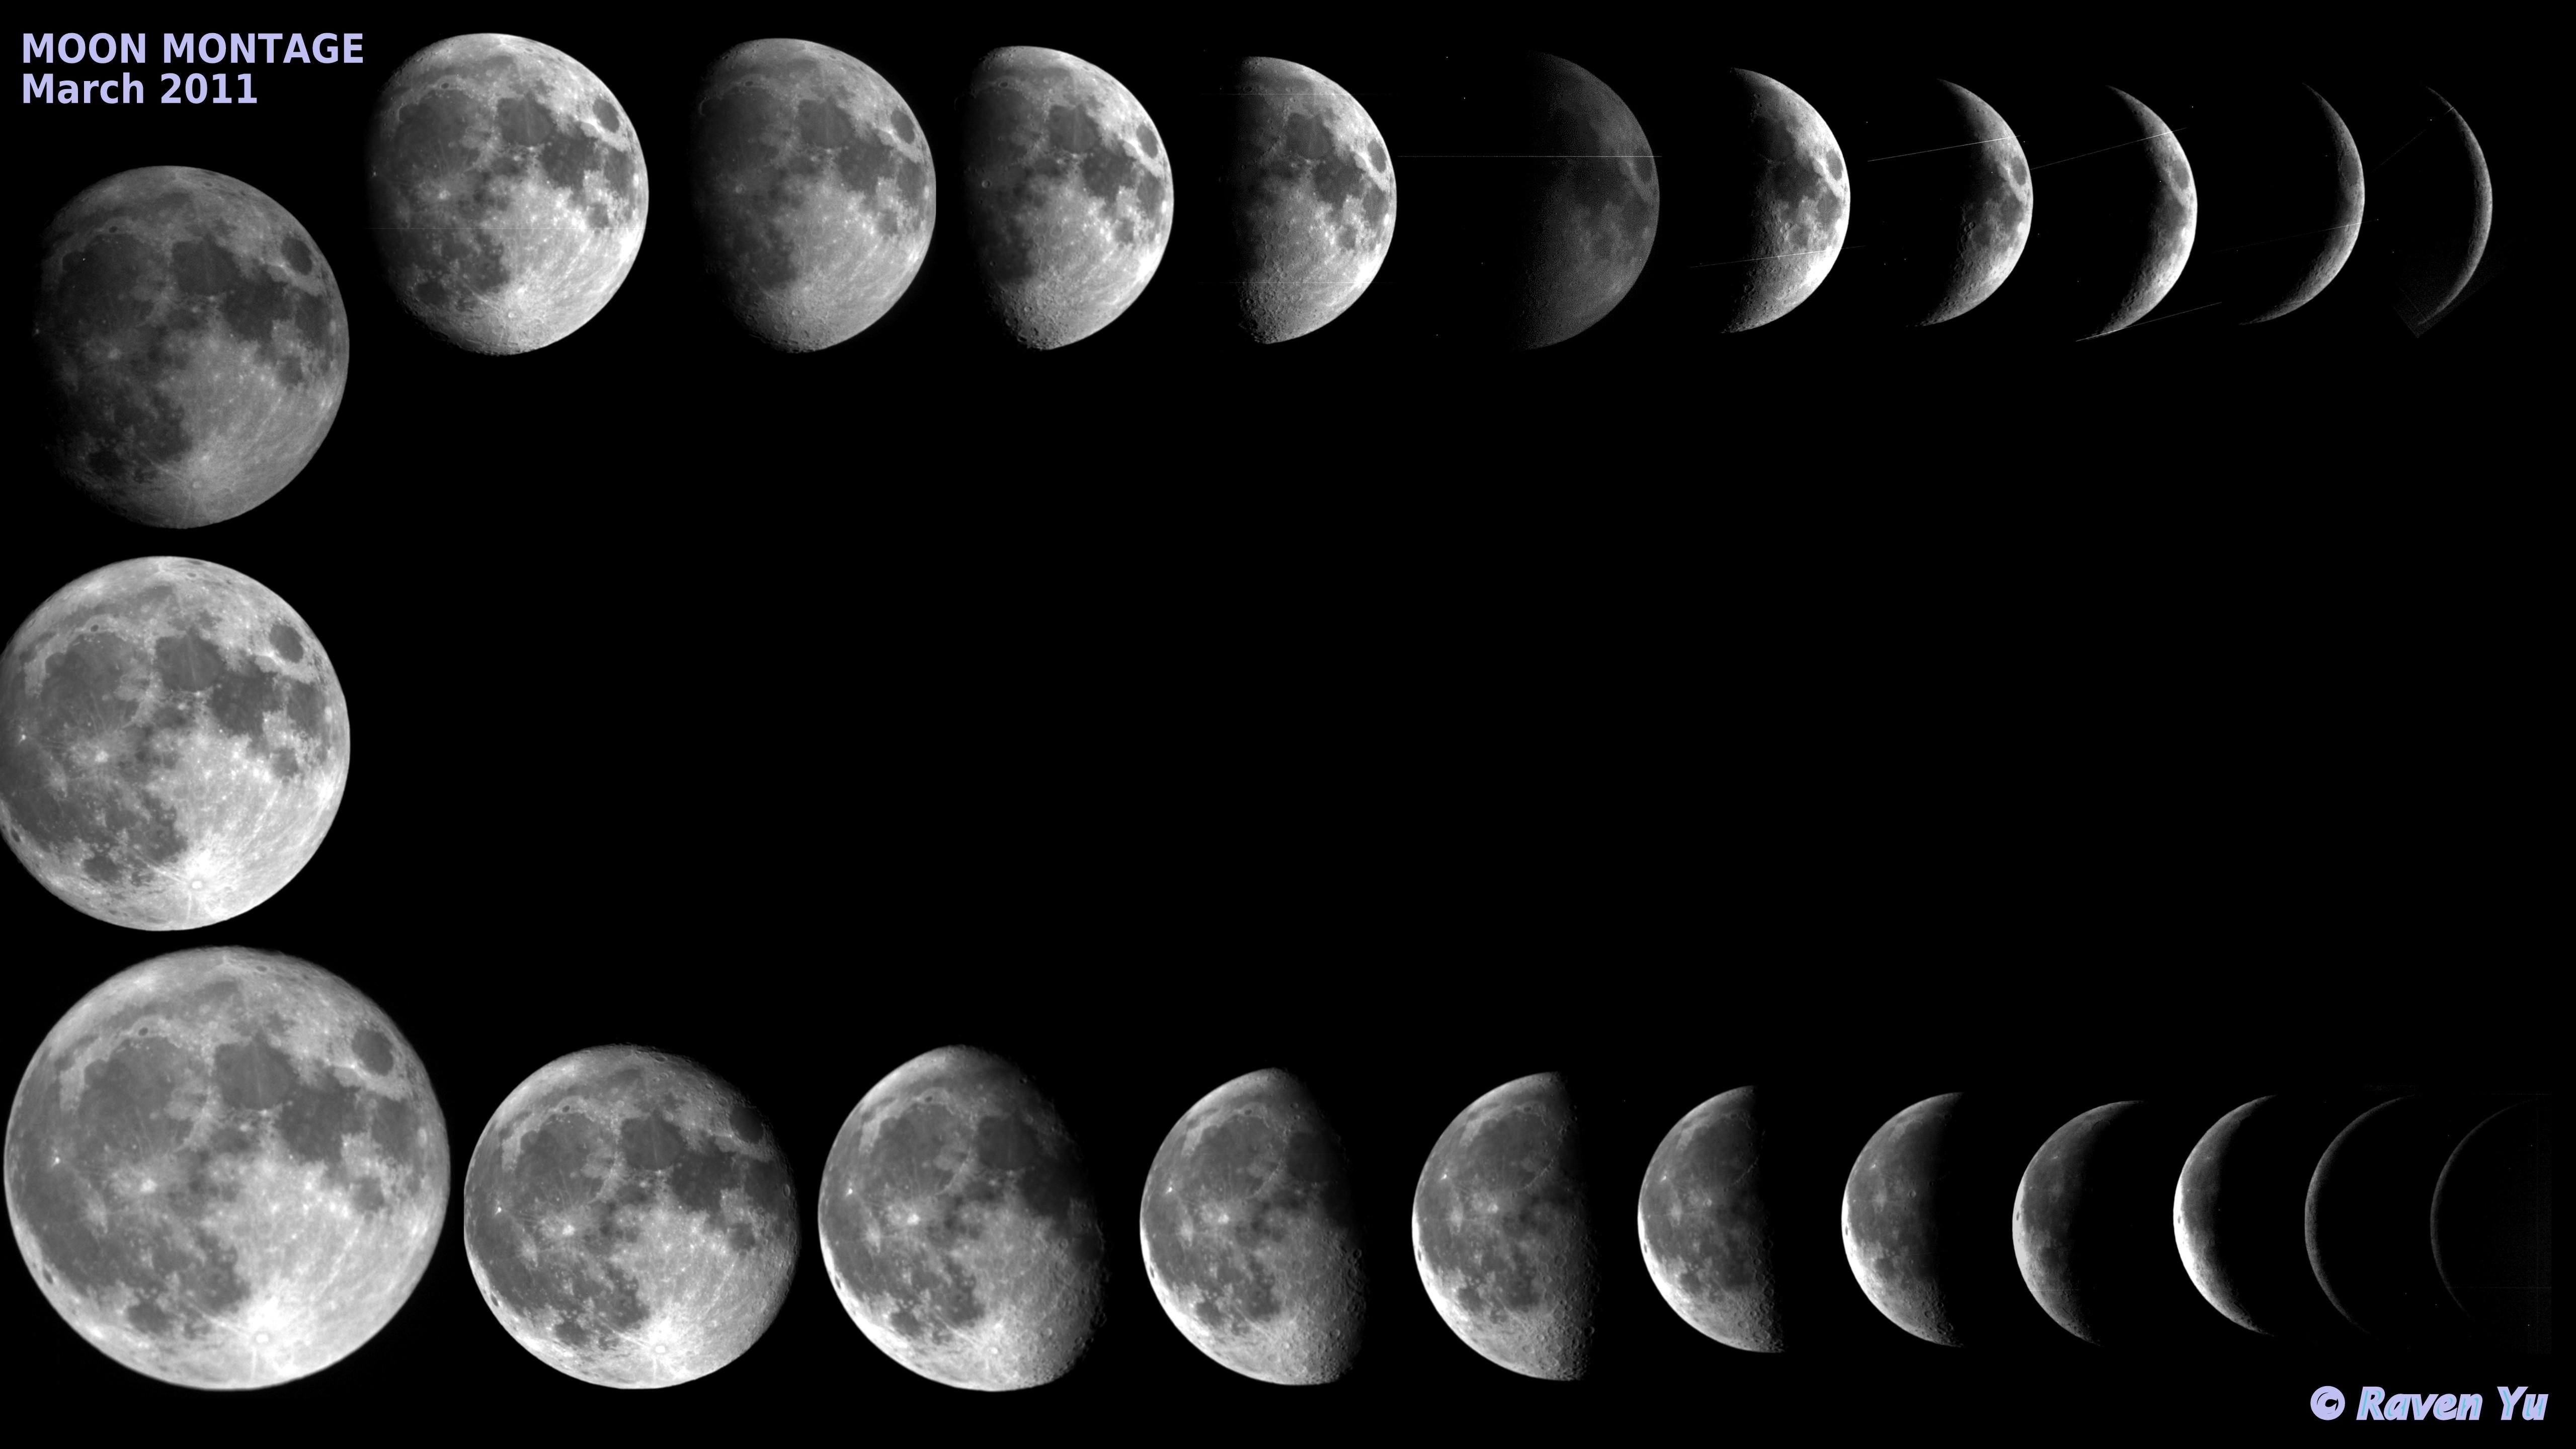 nasa lunar cycles - photo #27